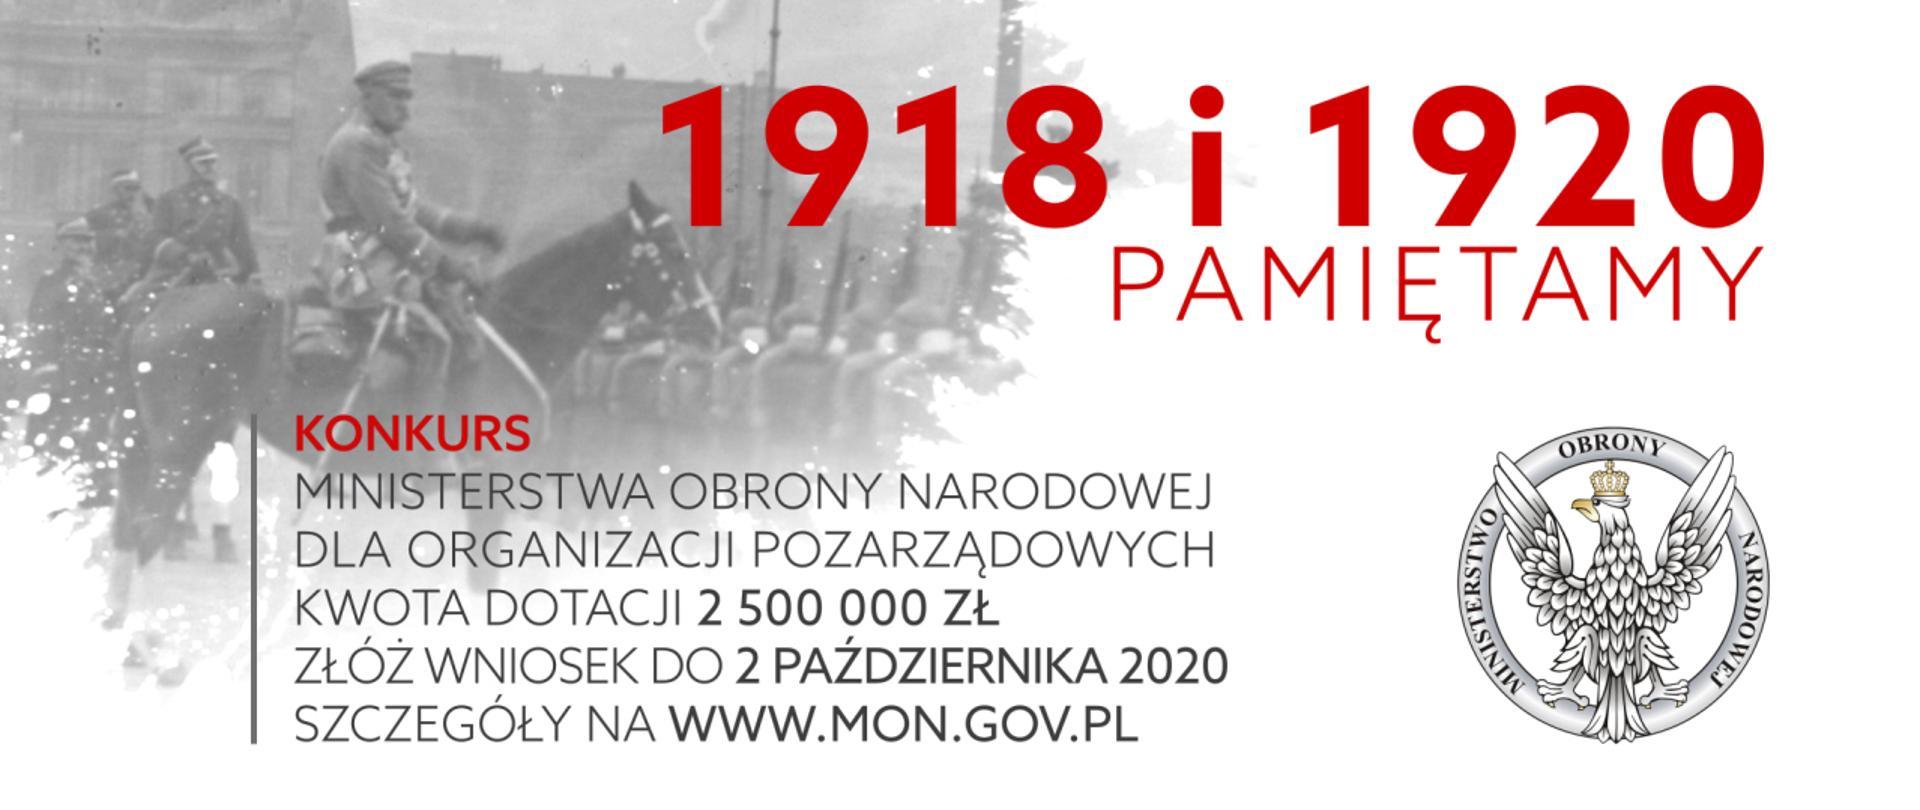 Grafika na konkurs 1918 i 1920 Pamiętamy